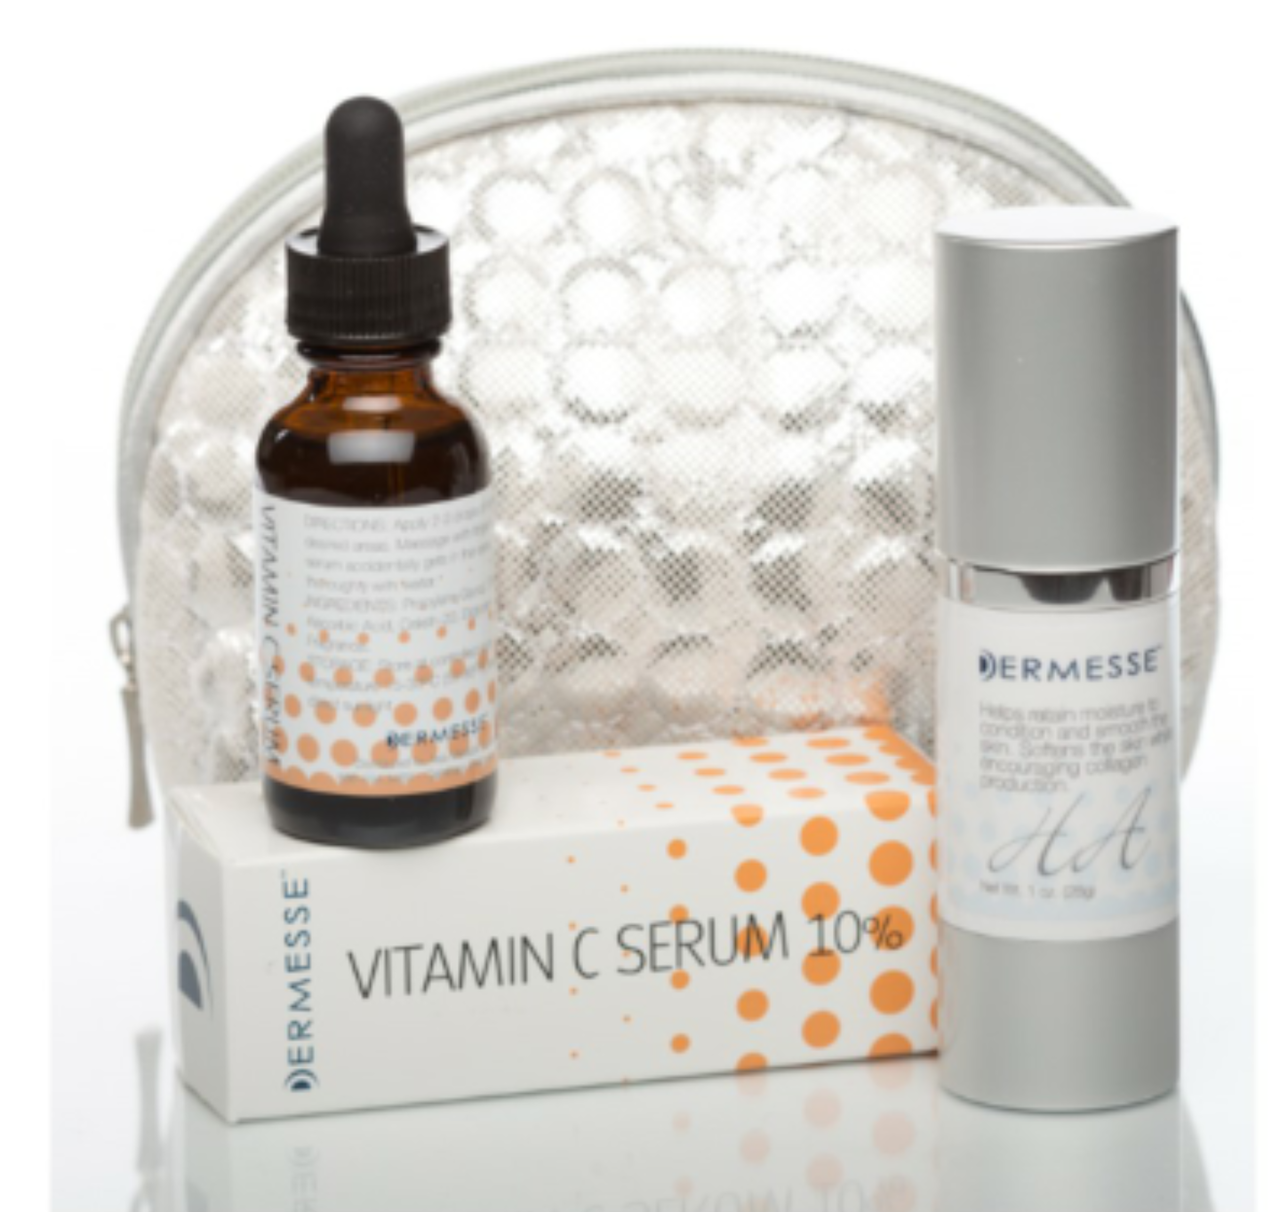 ff9c373e453 ... Vitamin C 10% + Hyaluronic Acid. Image 1. Loading zoom